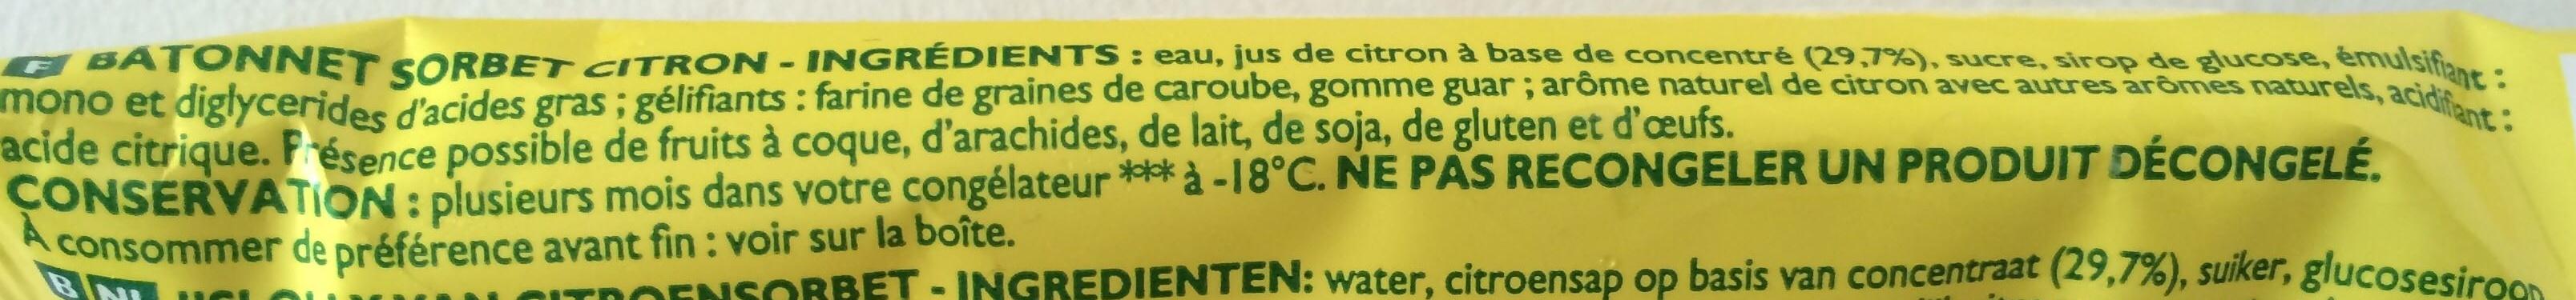 Pulco Citronnade sorbet - Ingredients